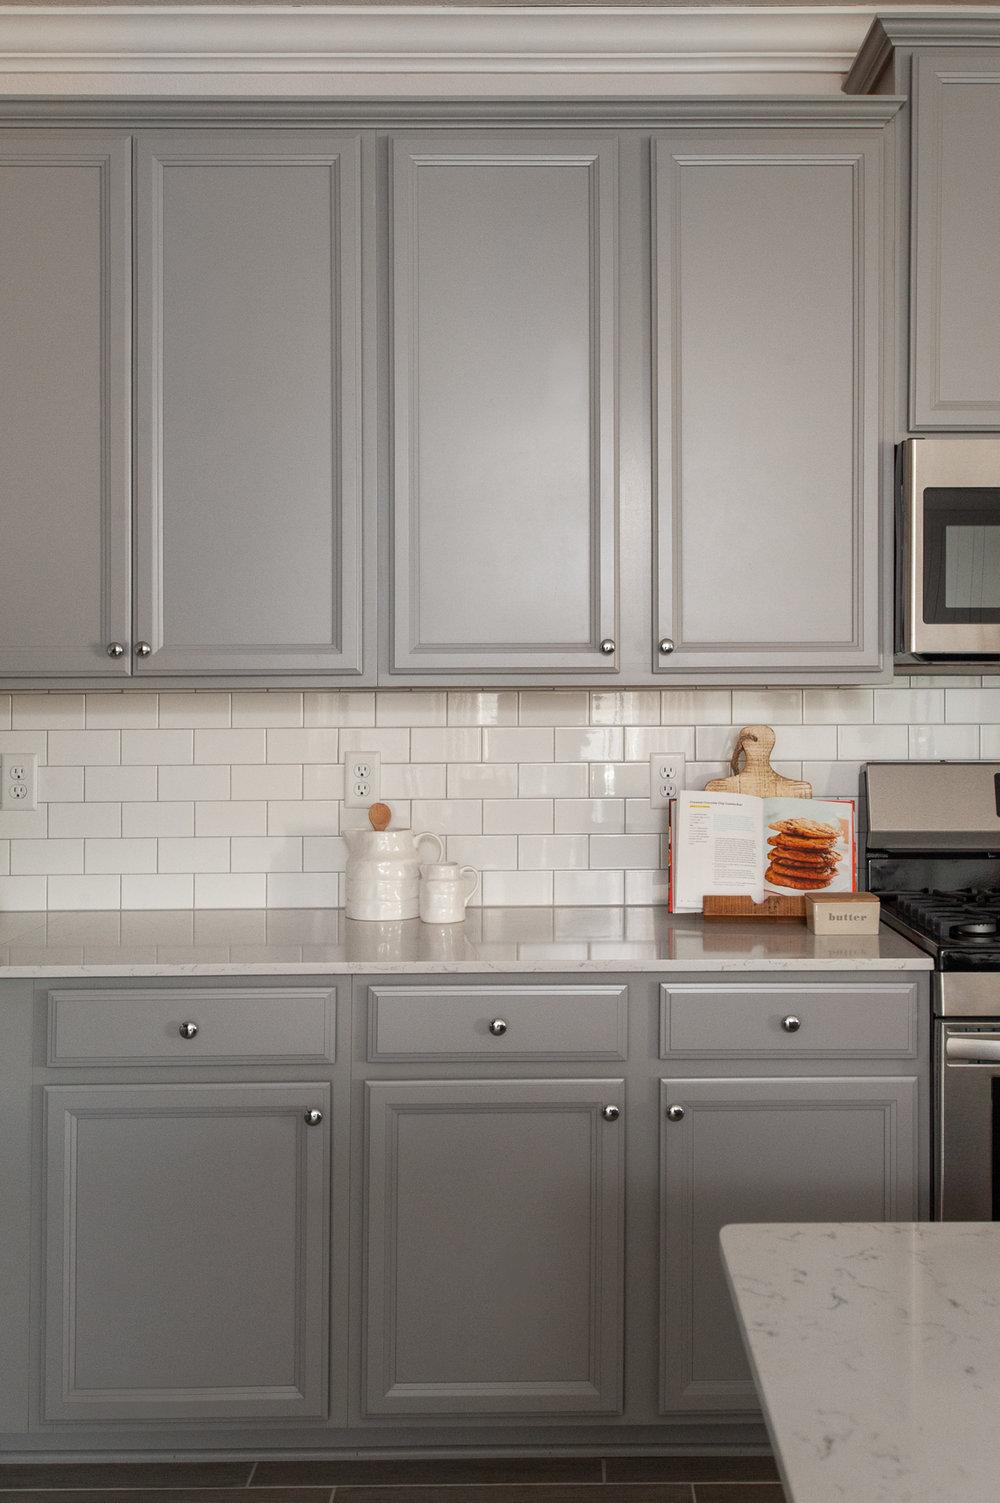 Micamy_Interior Designer_Design_Interior_Model_Merchandising_Kitchen_Grey_Cabinets_Forty West_Lennar_Cookbook_SubwayTile_Farmhouse.jpg